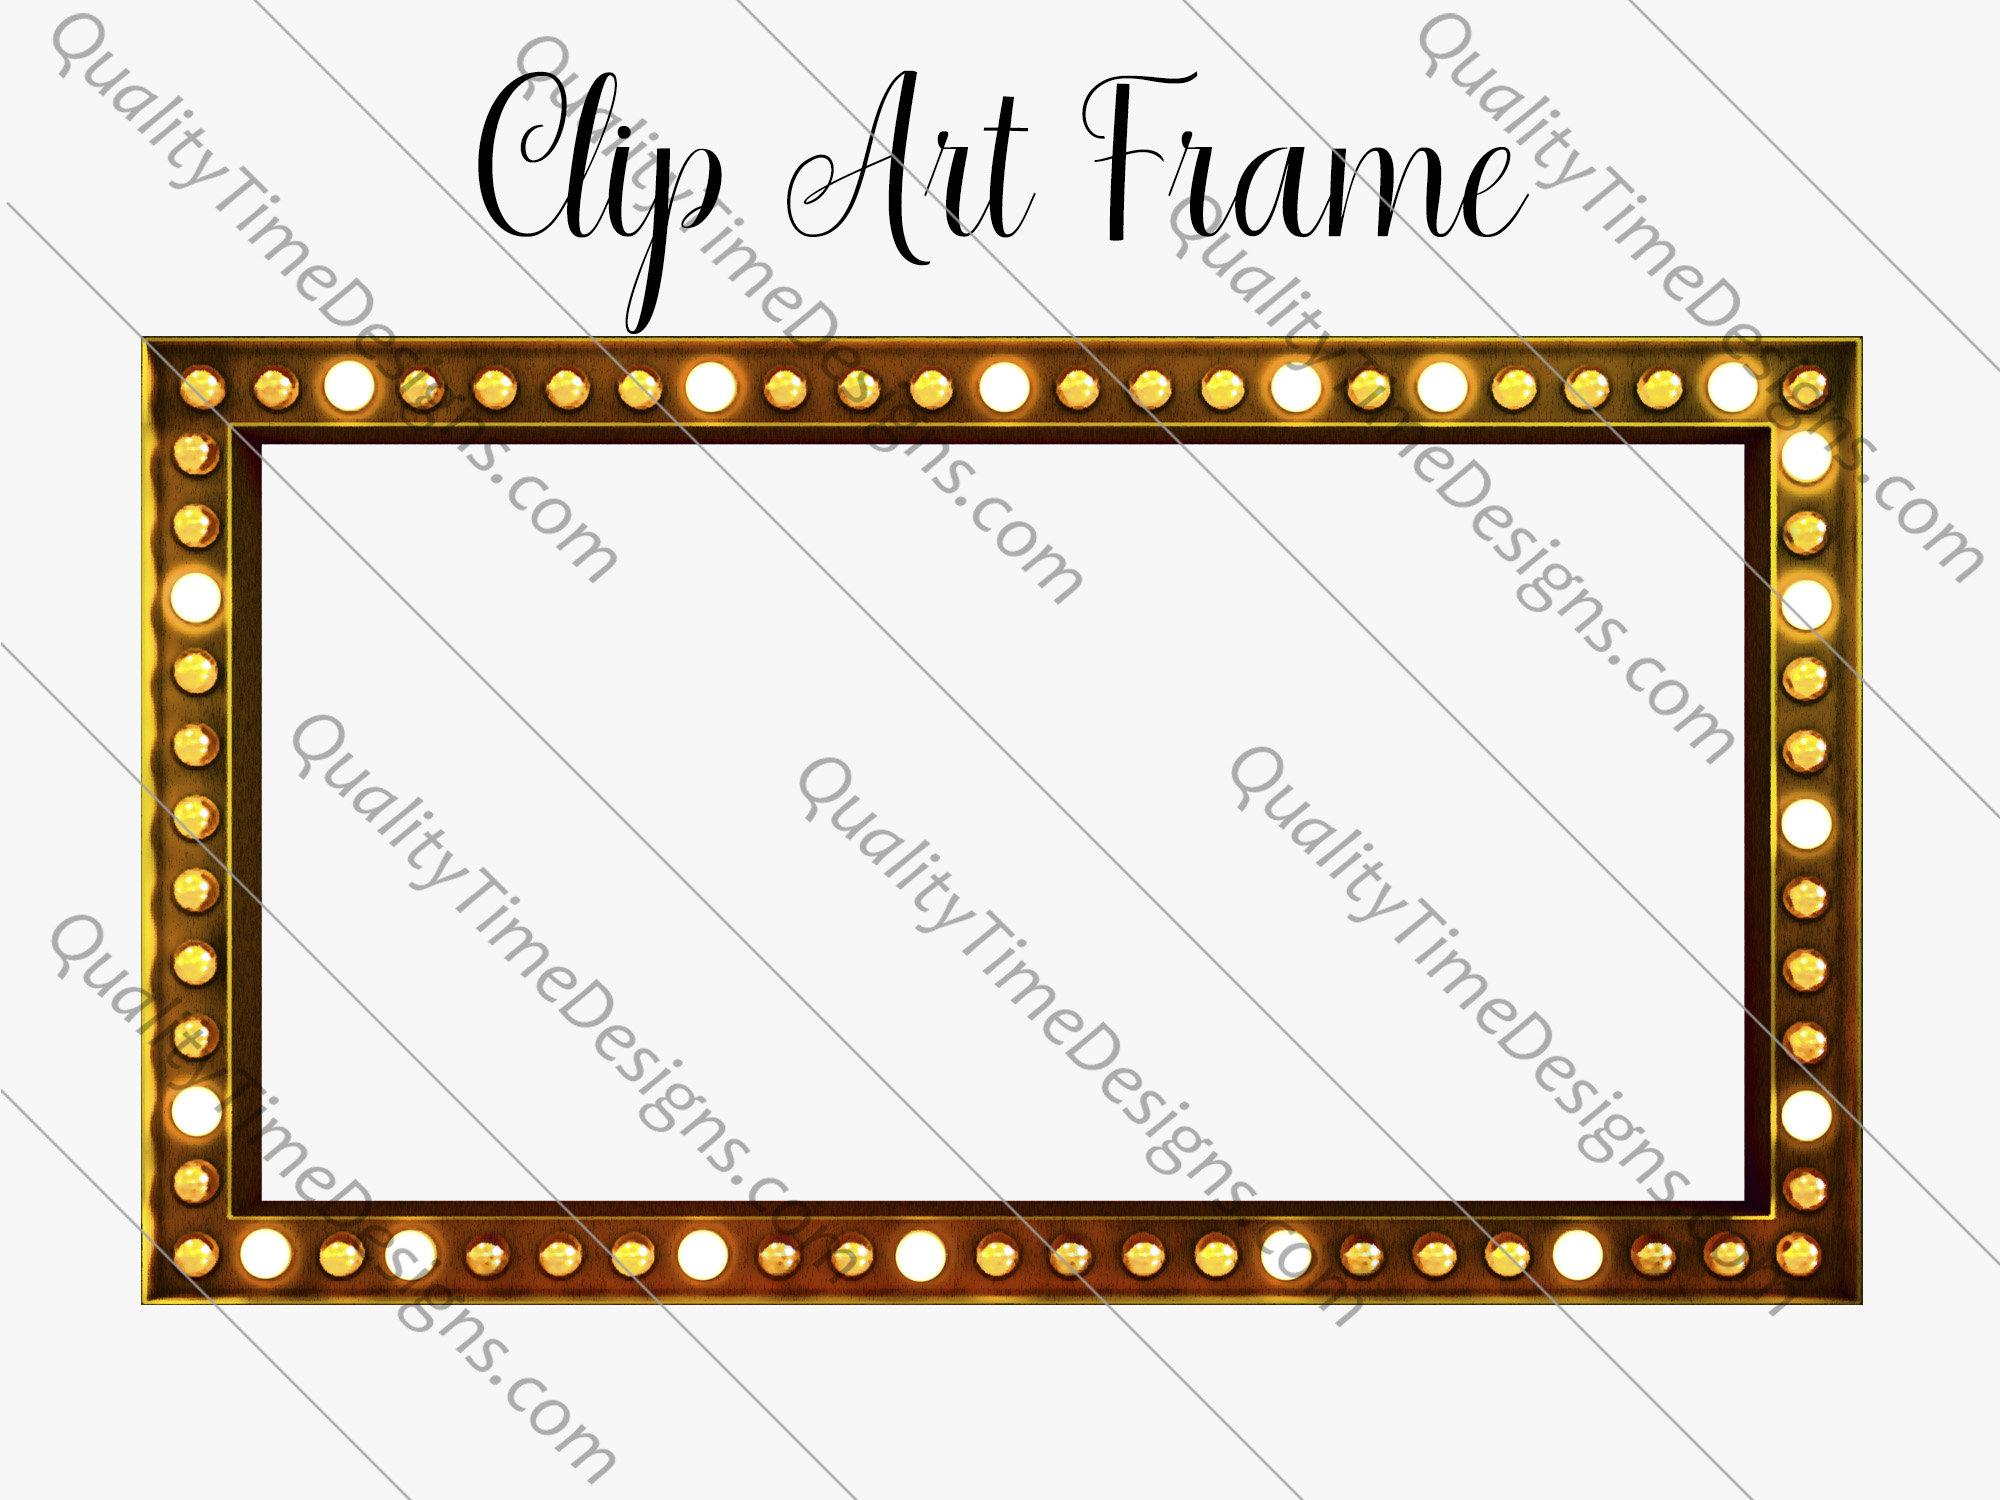 Gold Marquee Bling Show Biz Clip Art Frame.